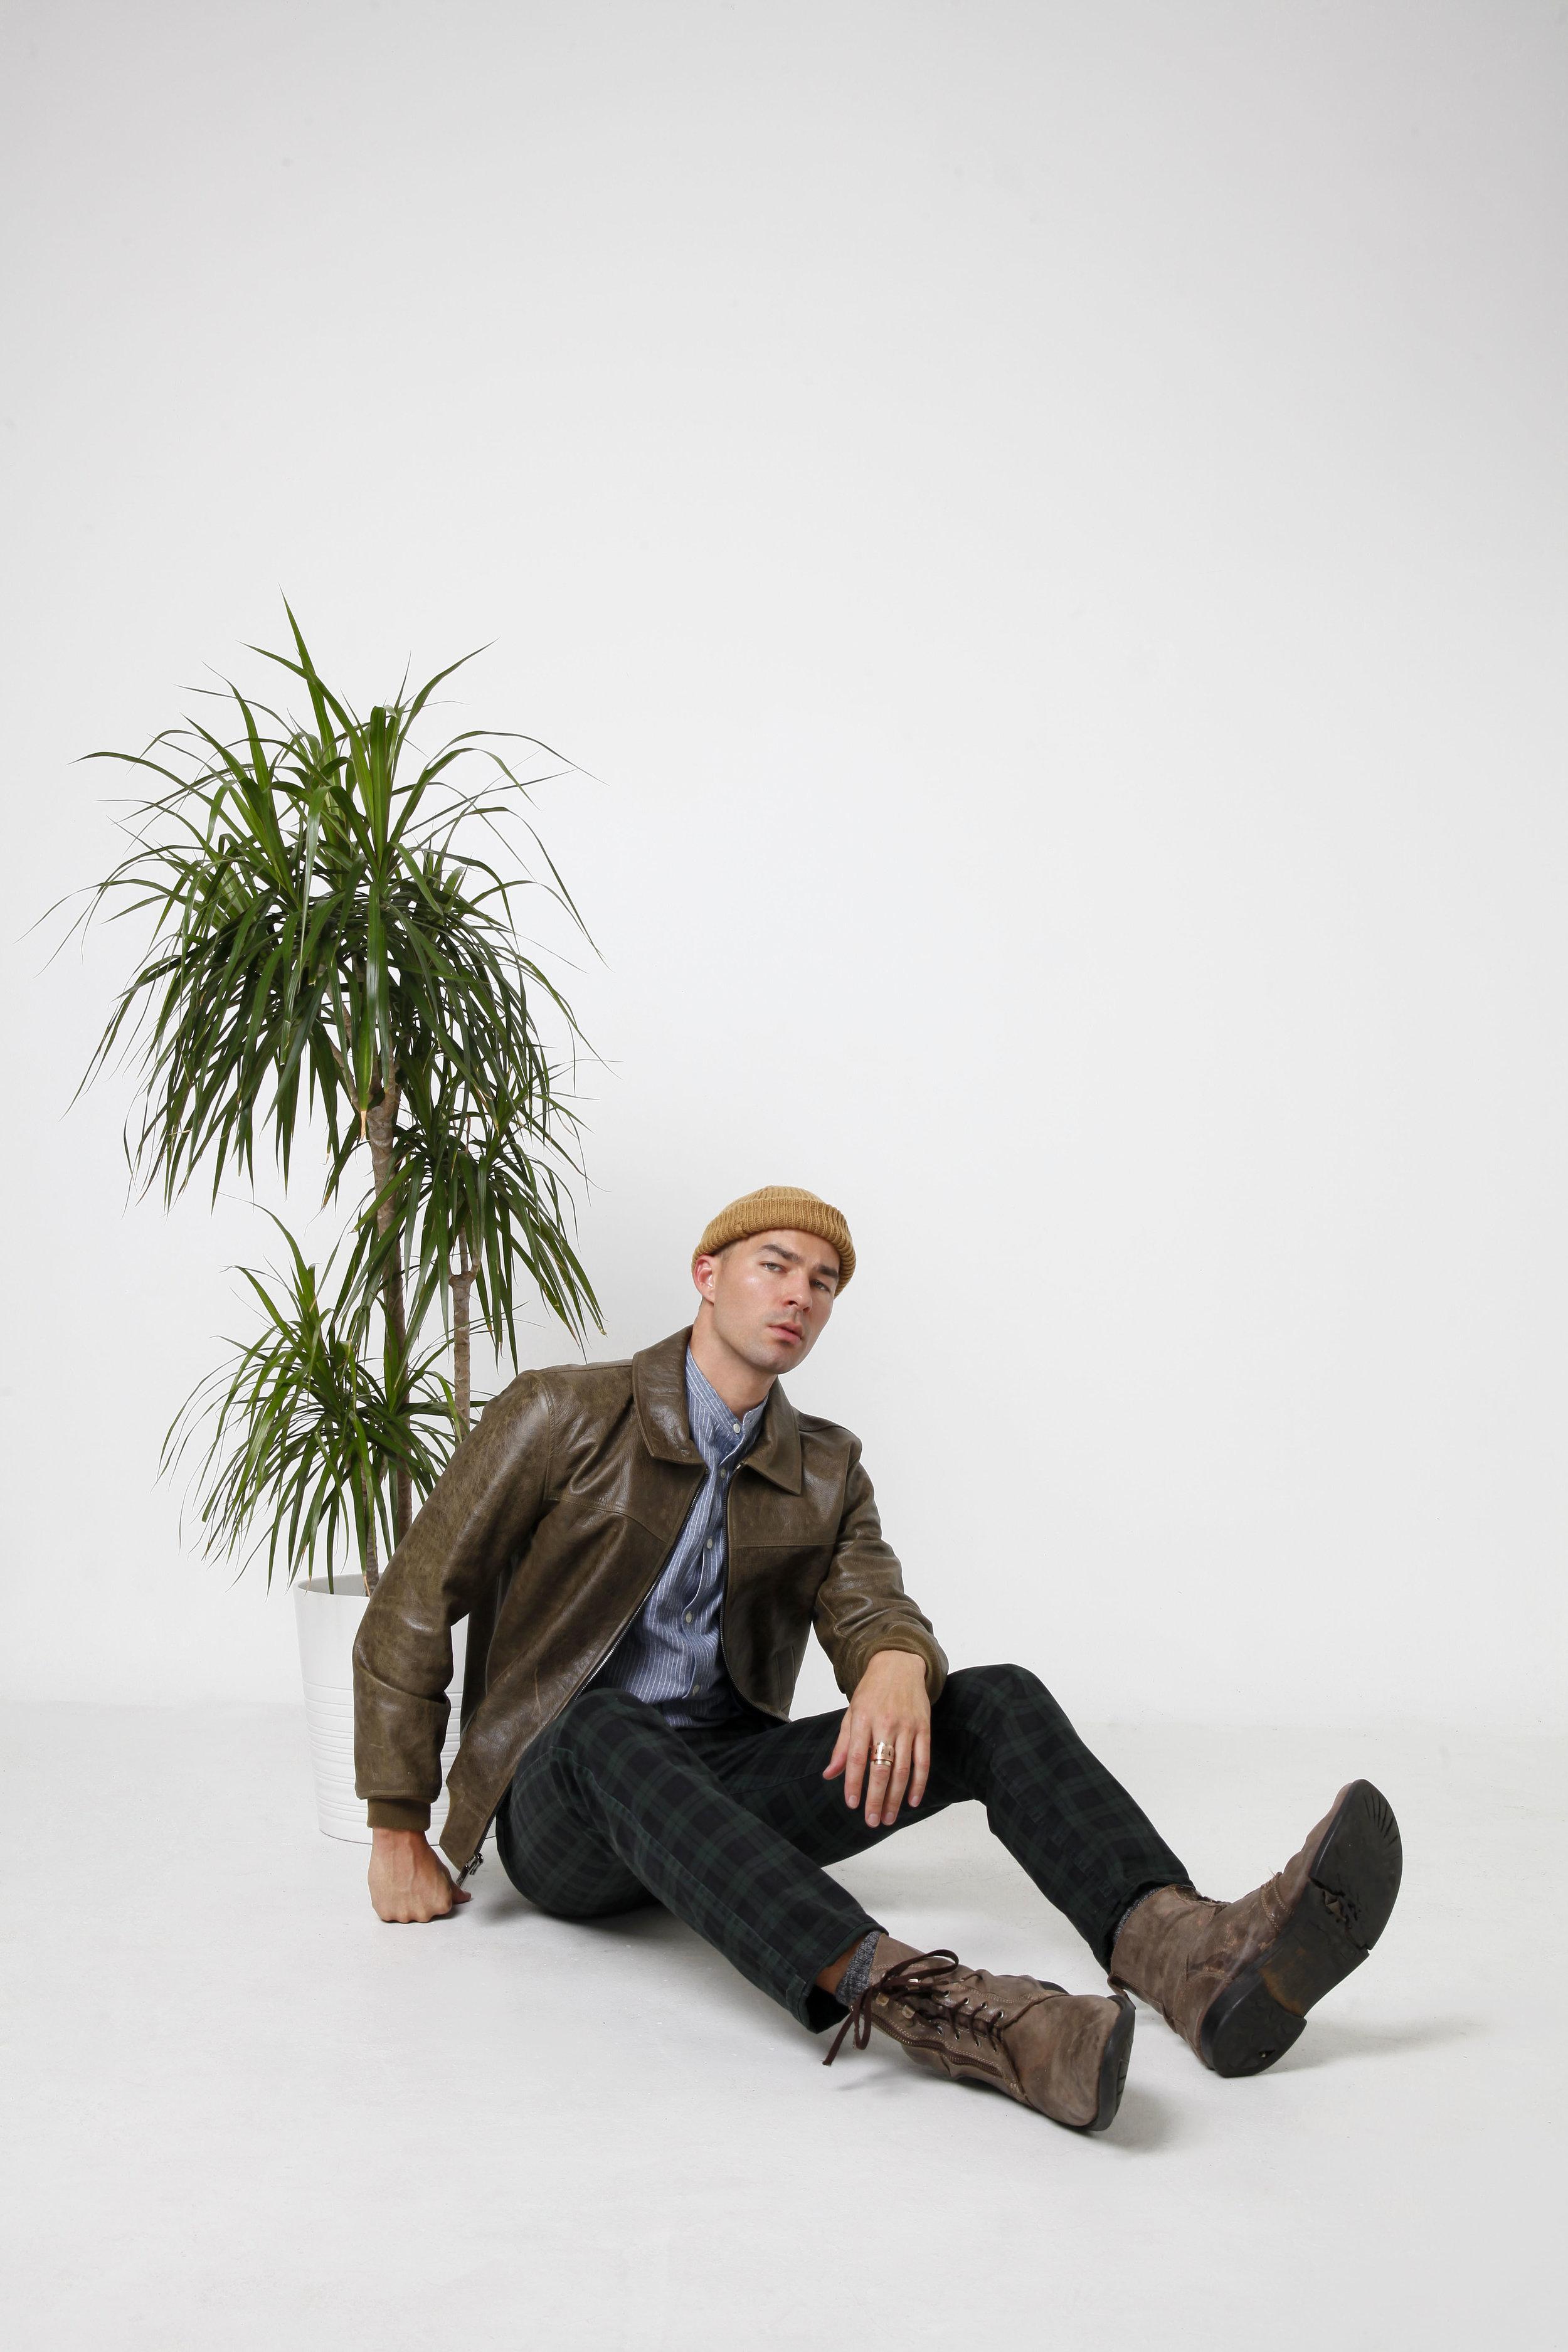 Codi Callahan x Steven G Photography x DT Model Management.JPG